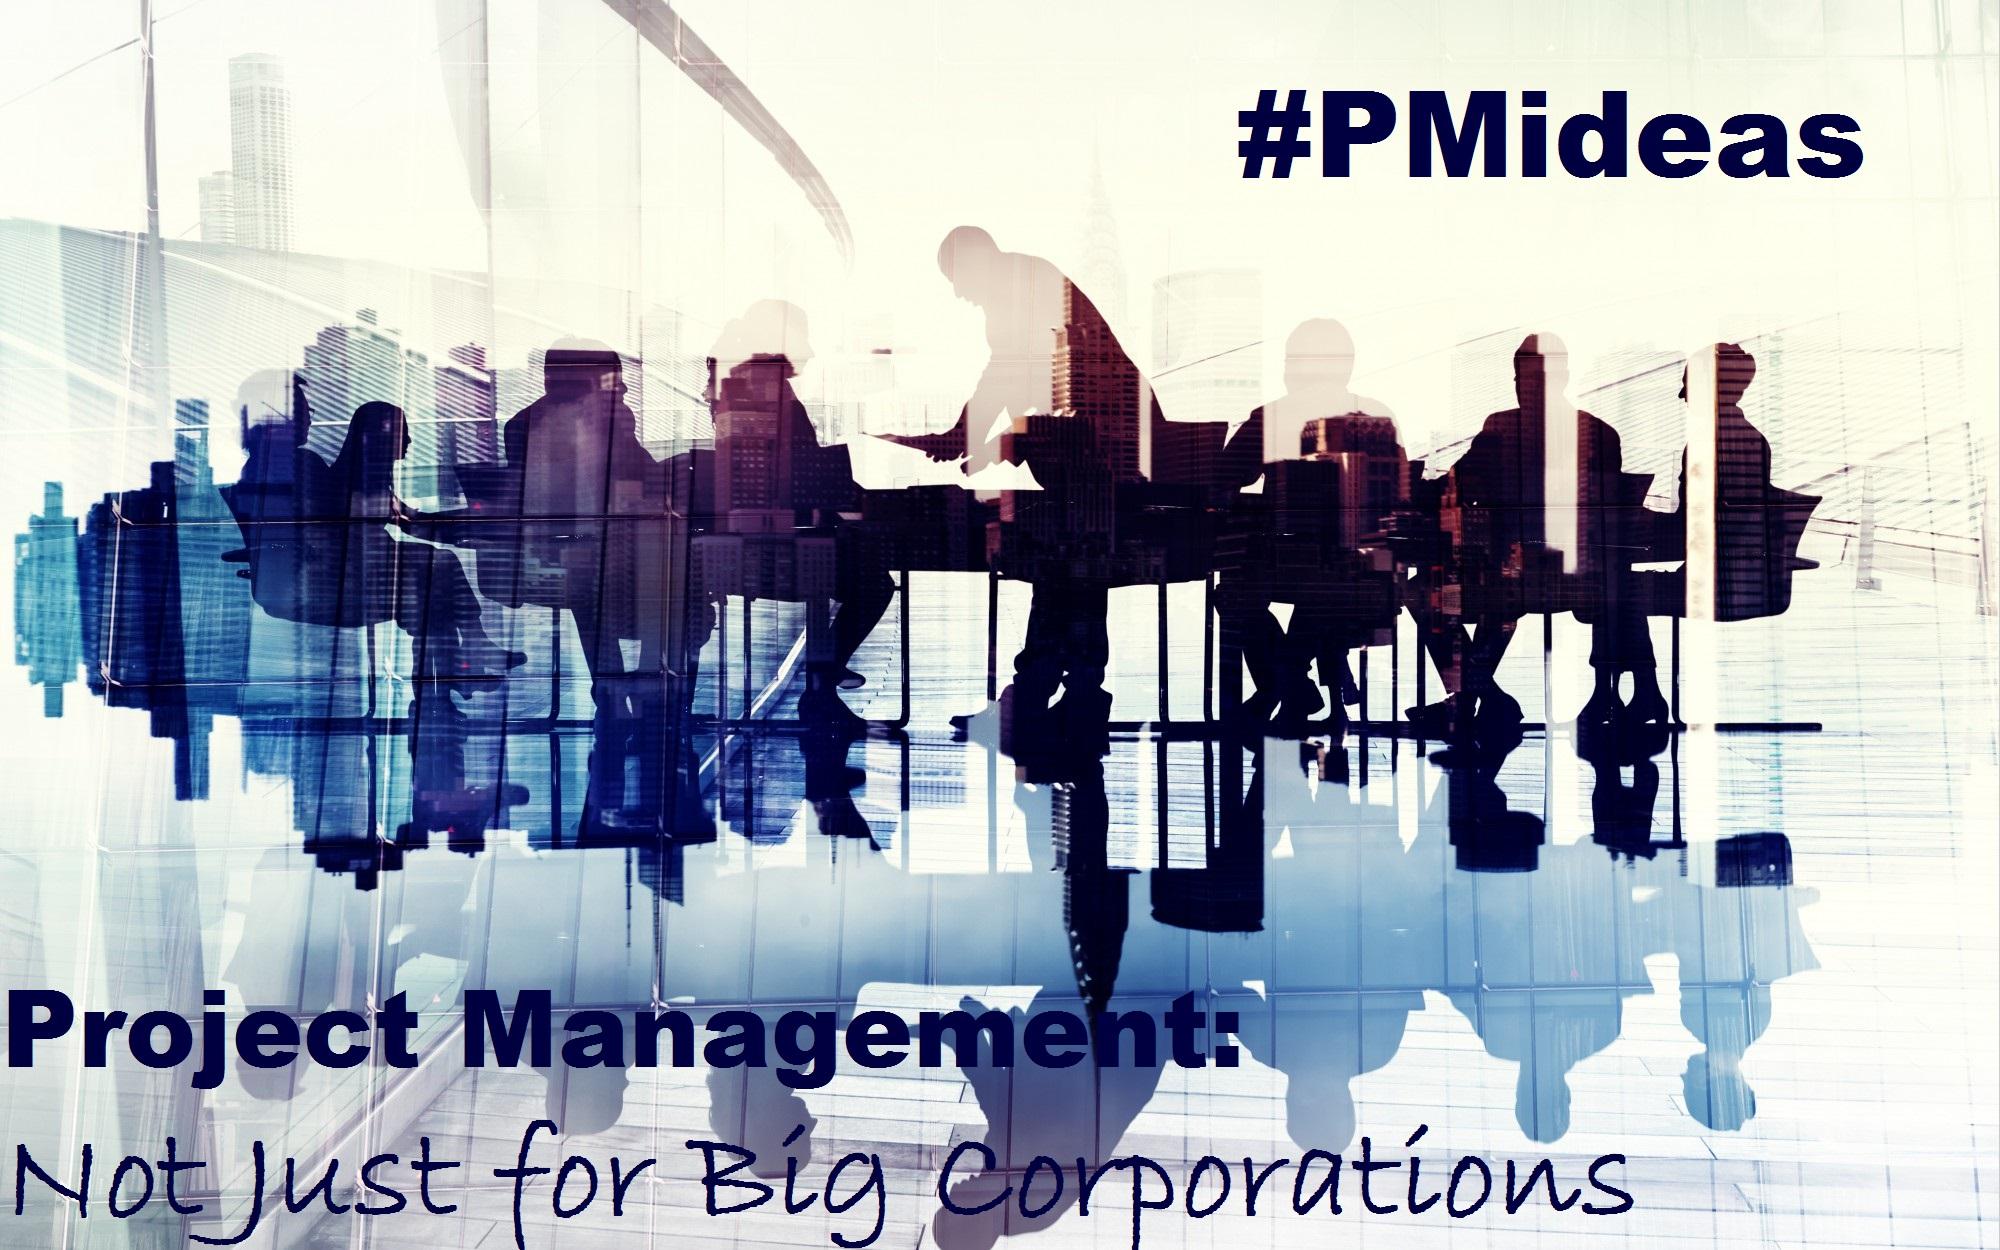 Project Management SMEs